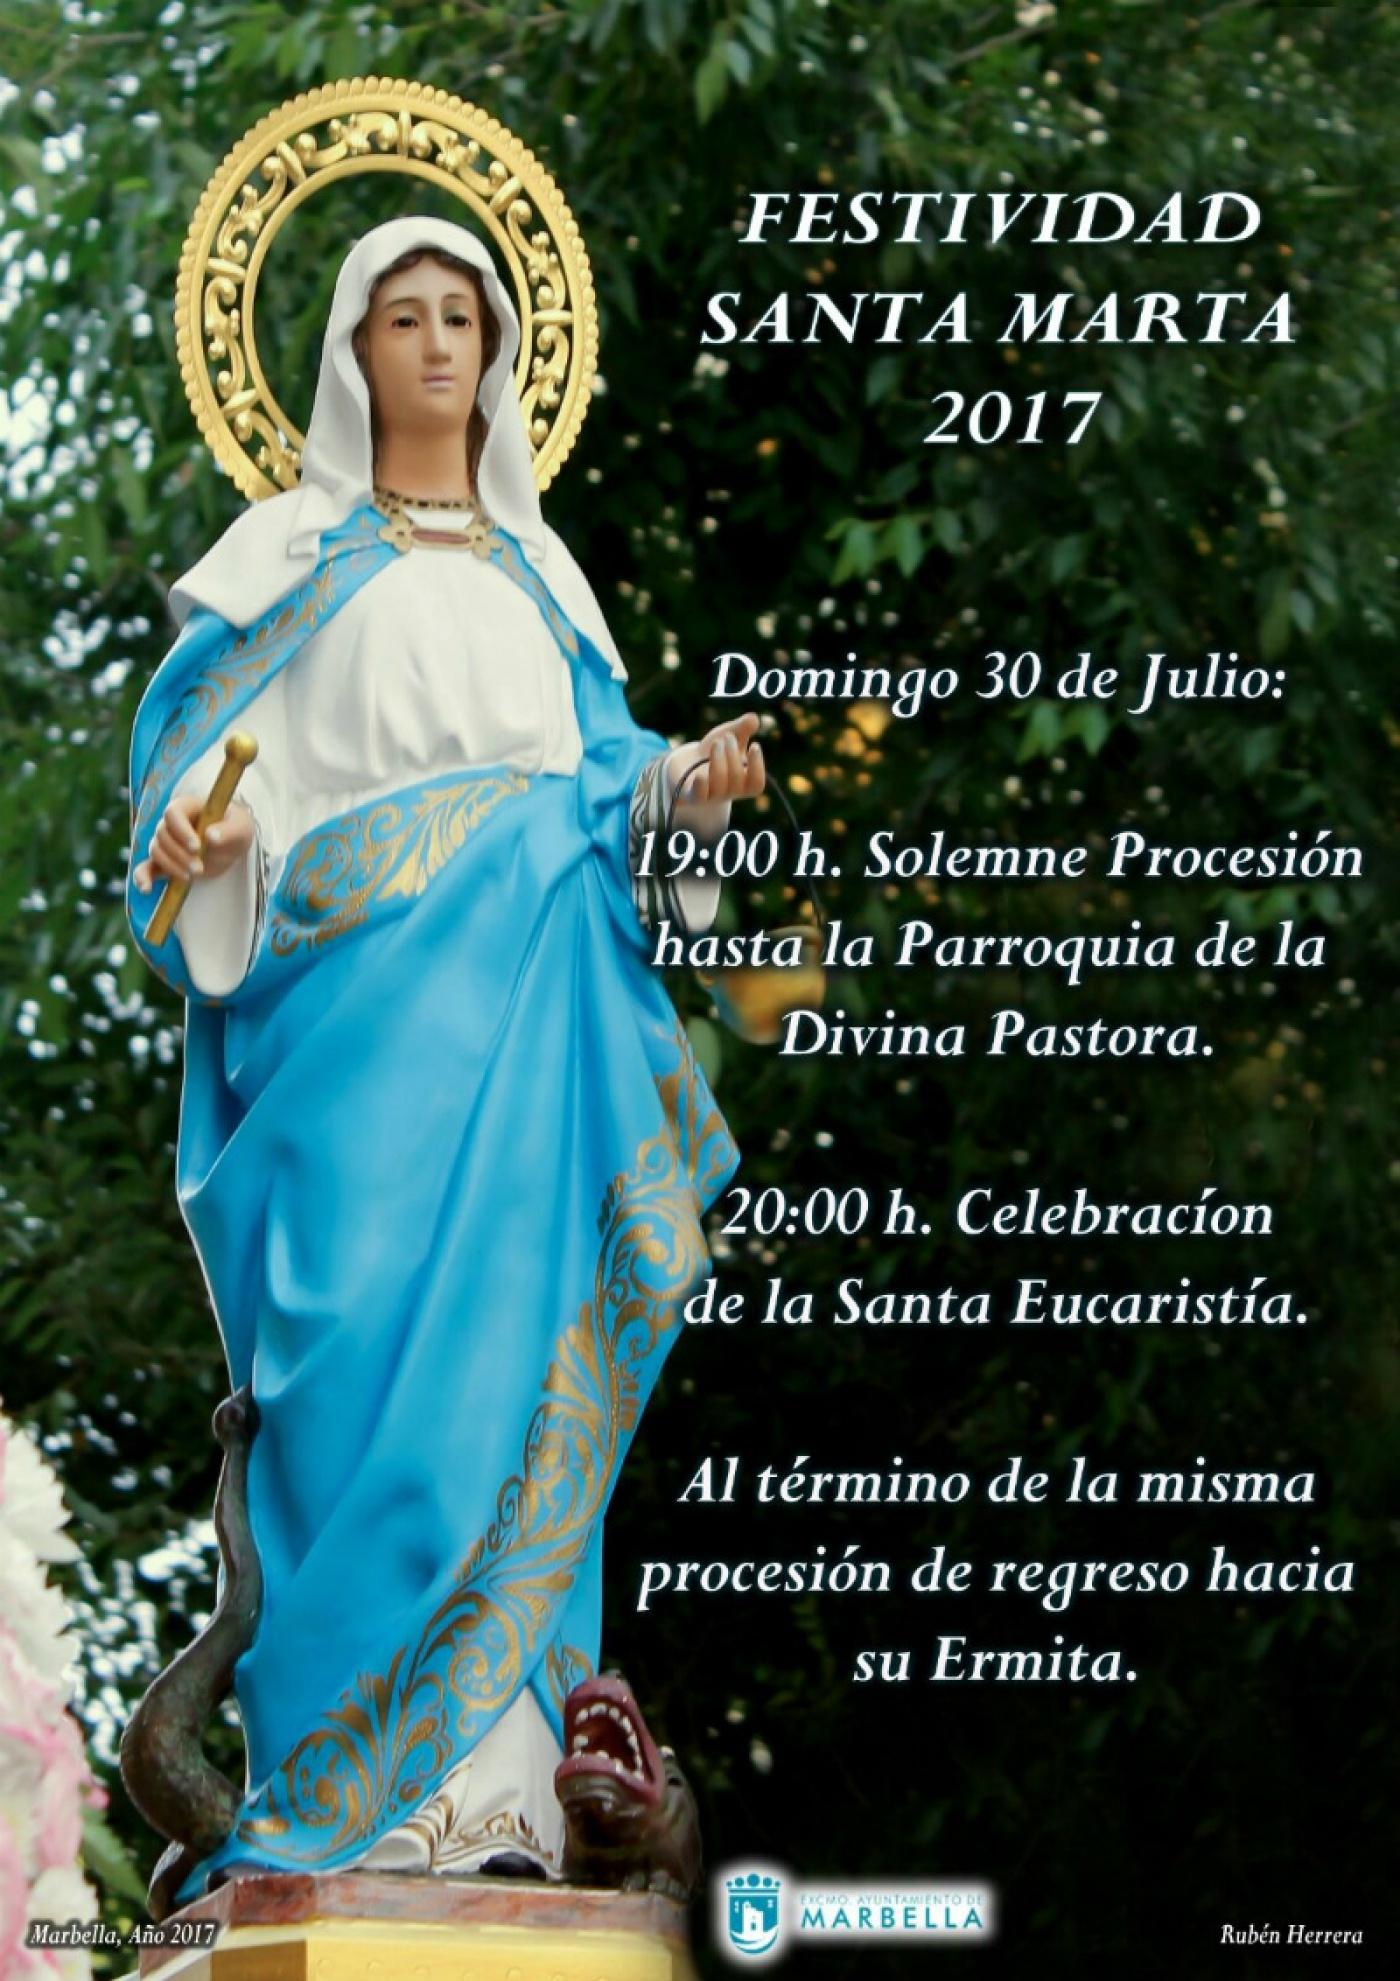 Marbella Sanpedro Com Festividad Santa Marta Marbella